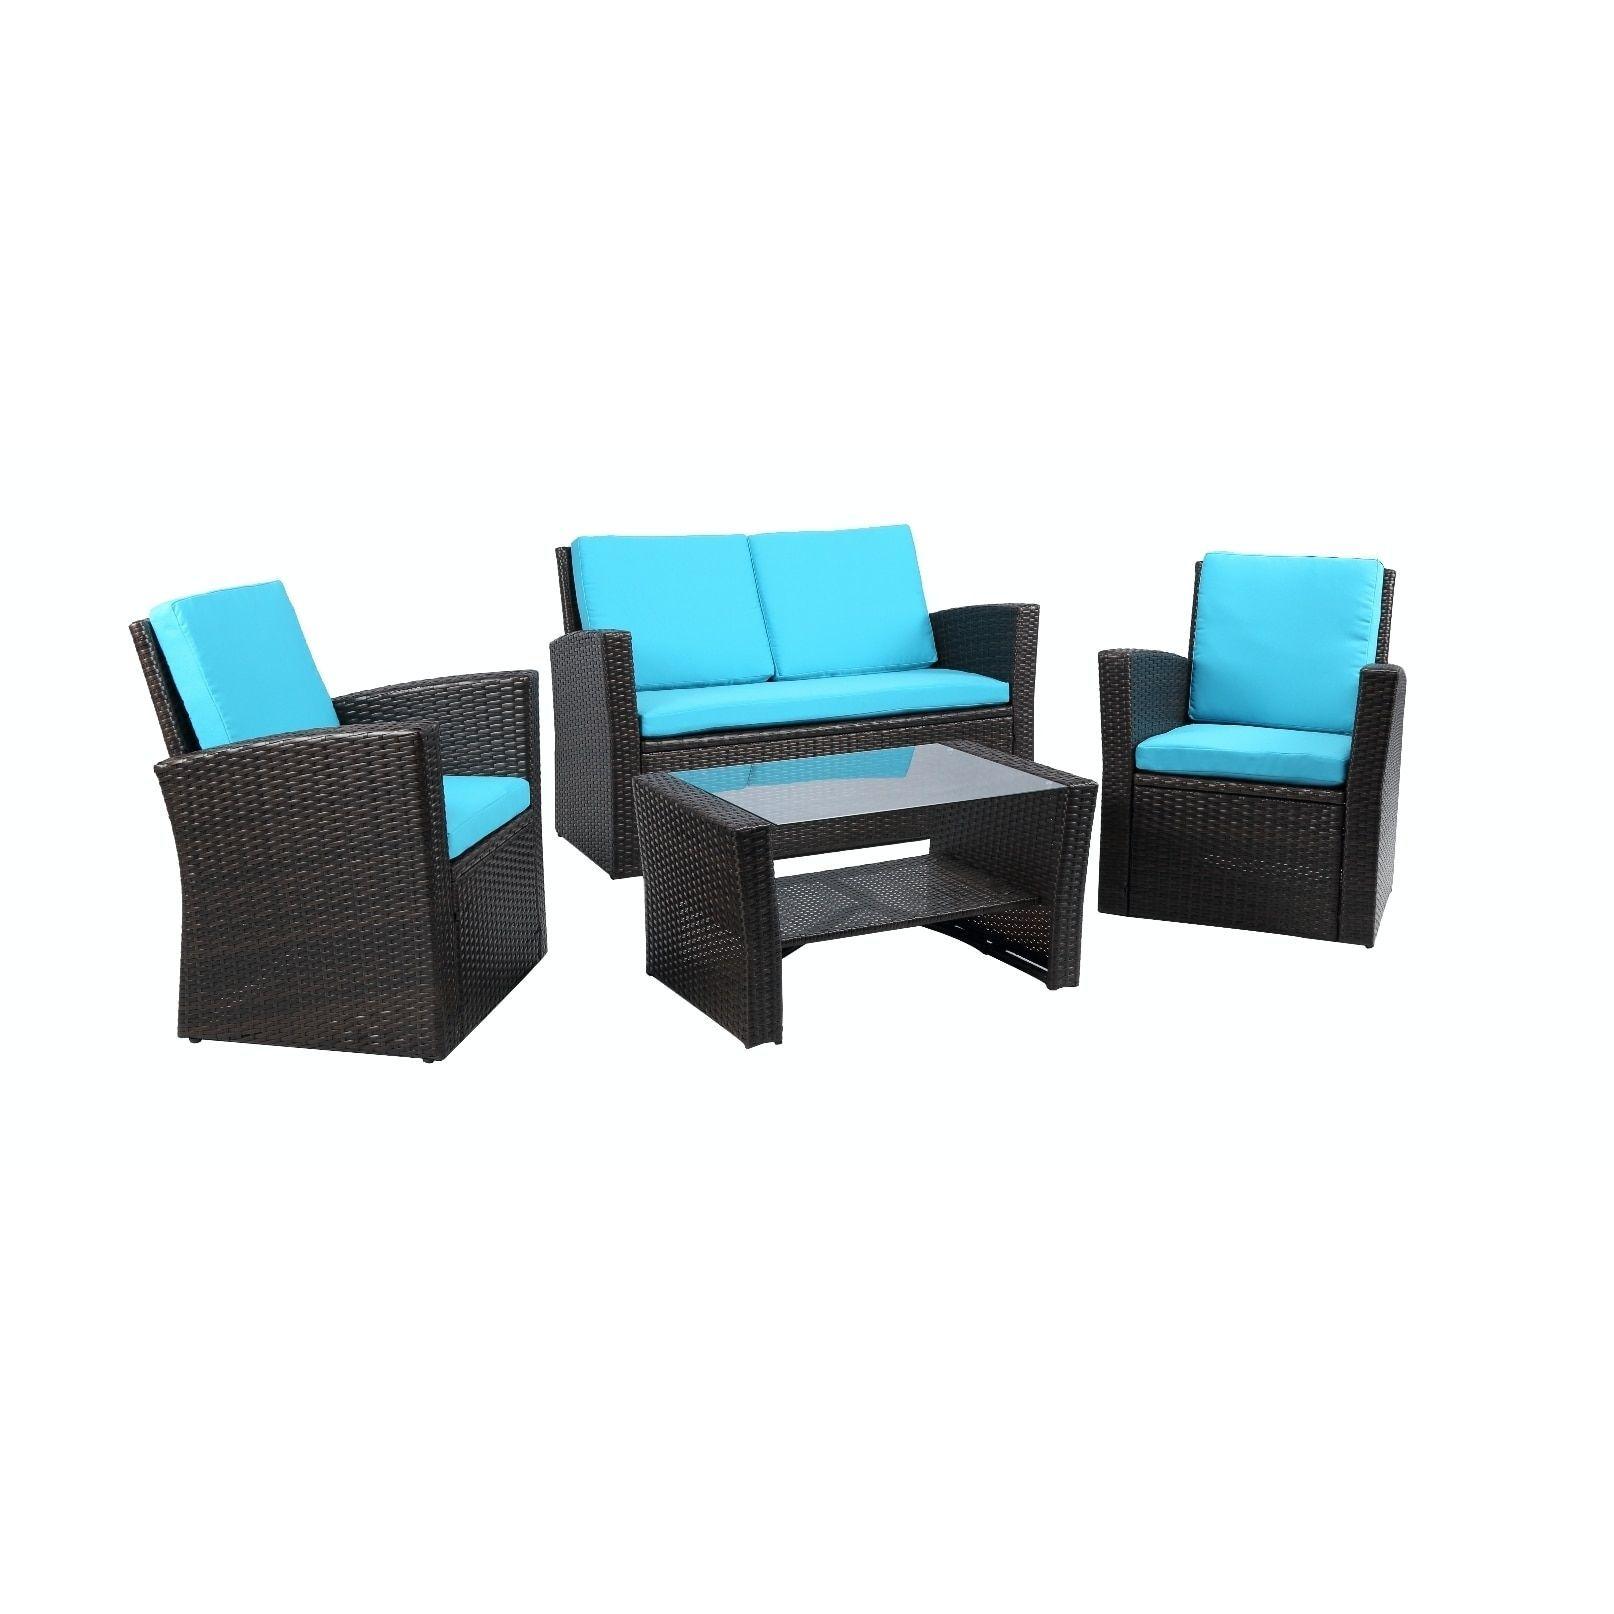 International Baner Garden Outdoor Furniture Complete Patio 4 pieces Cushion PE Wicker Rattan Garden Set, , Patio Furniture